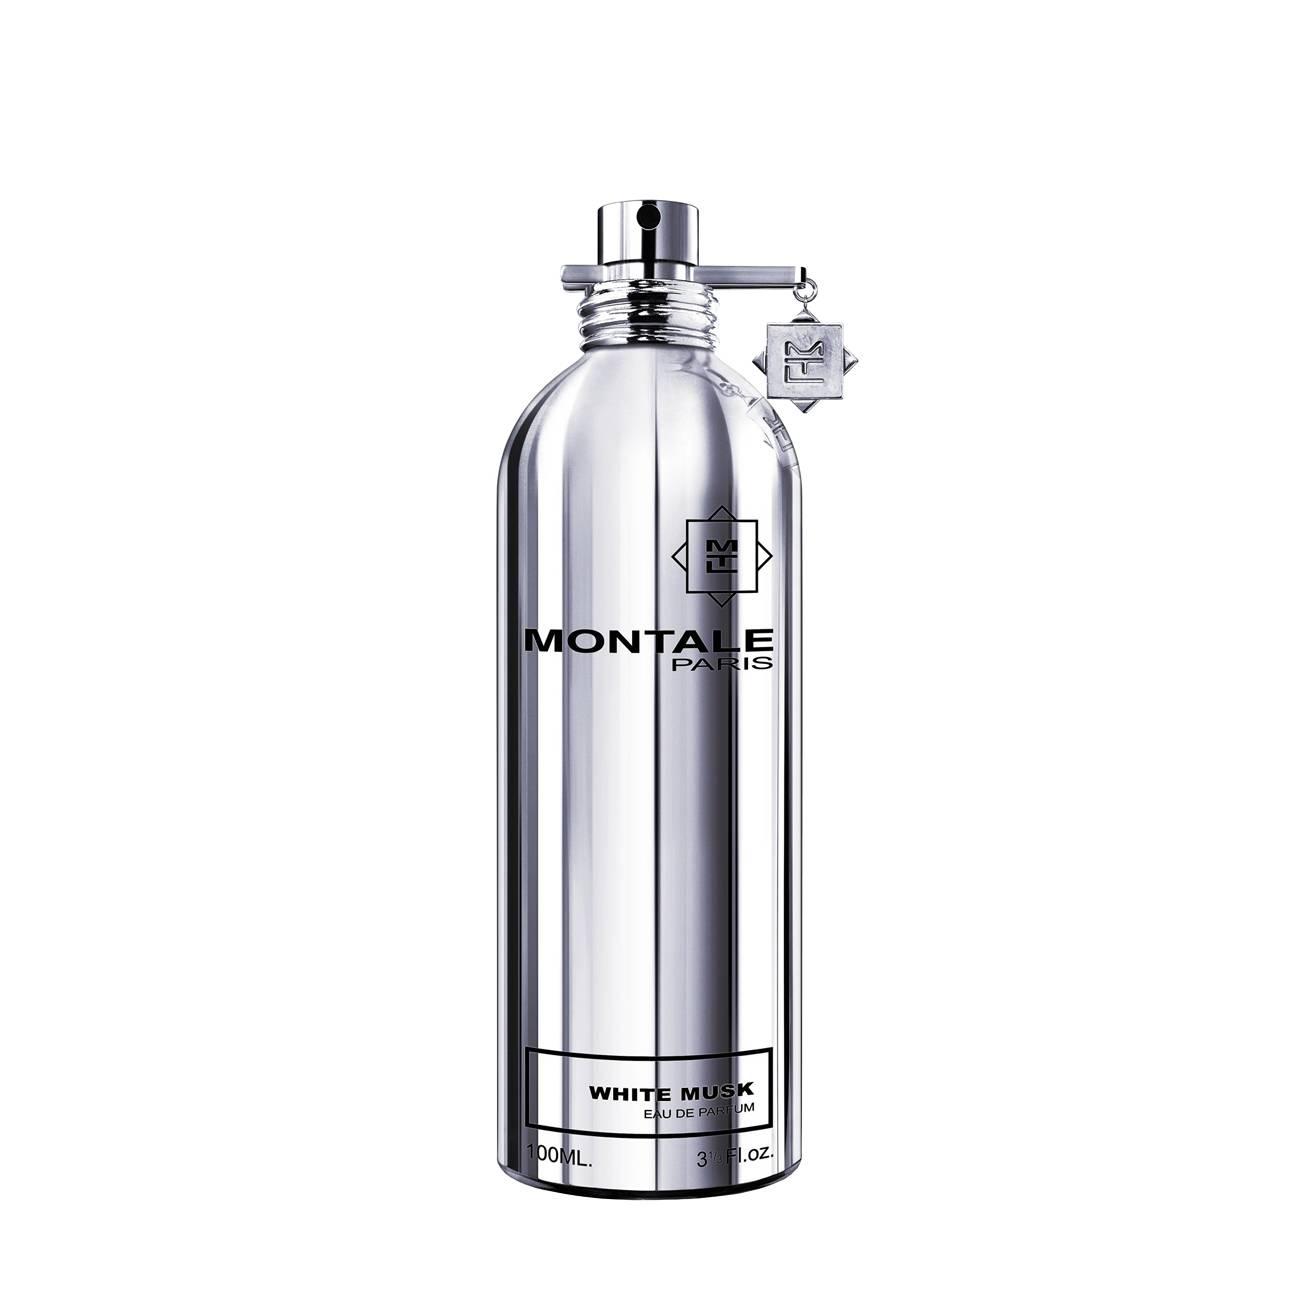 WHITE MUSK 100ml imagine produs